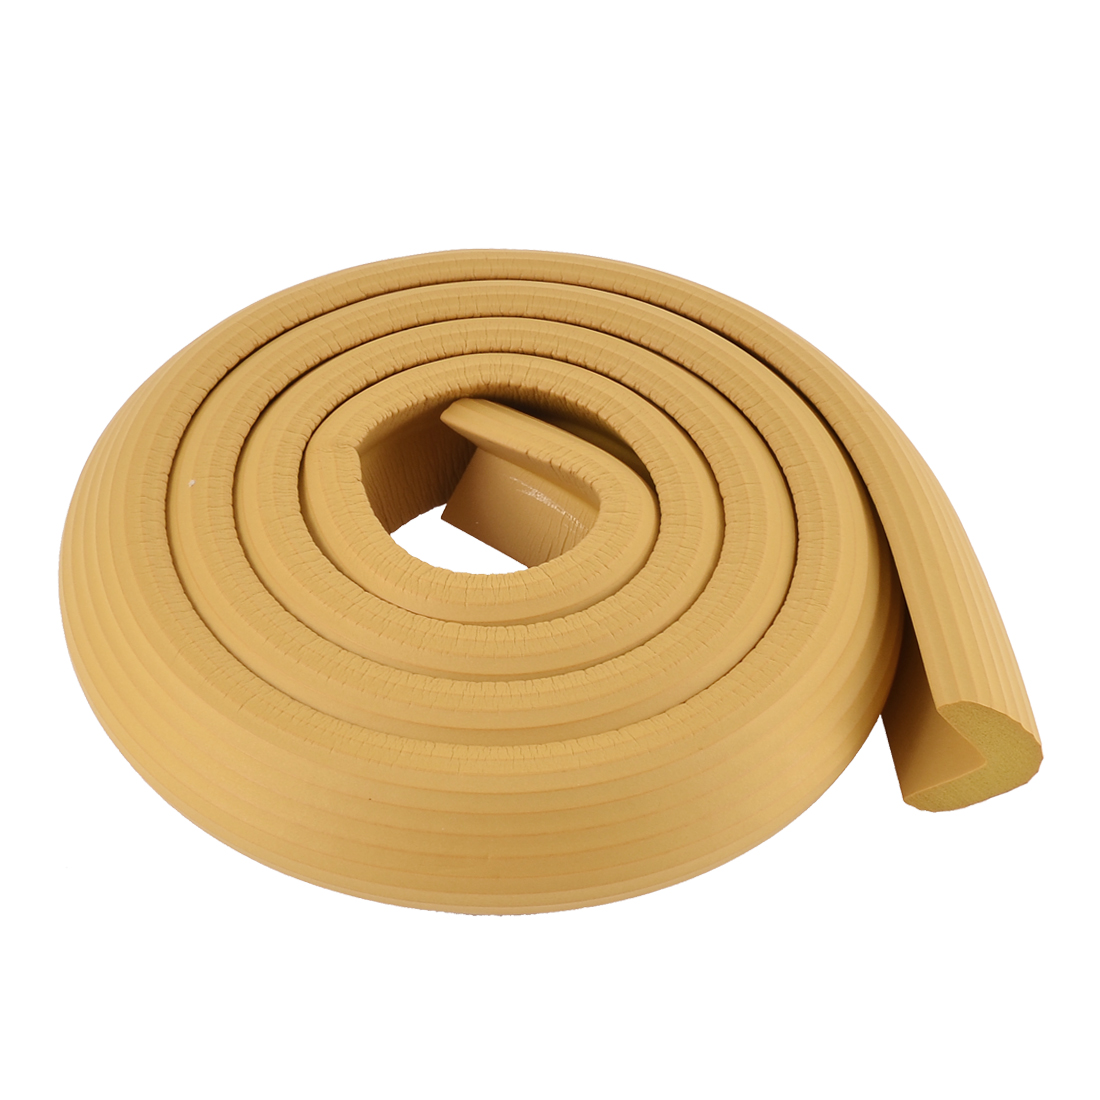 Table Corner Edge Soft Protection Cushion Guard 2M Wood Color